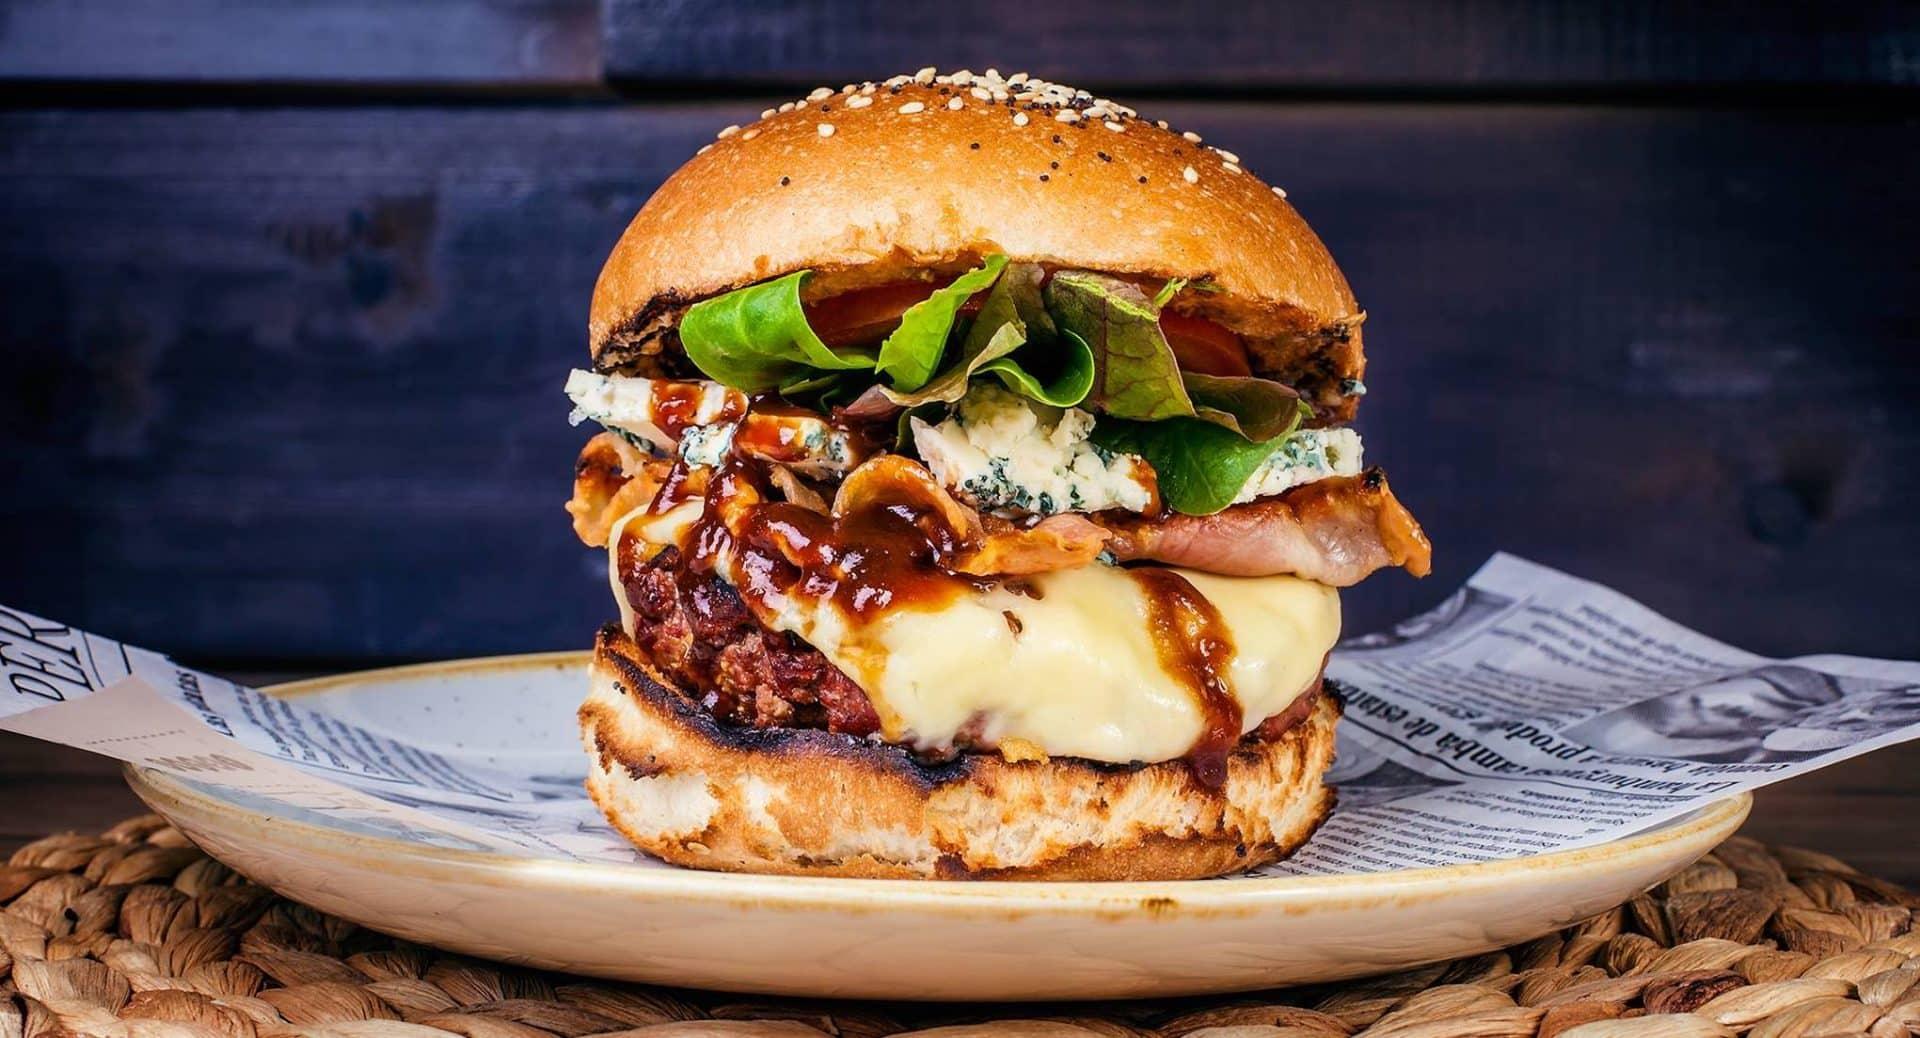 Best Burger in Oslo